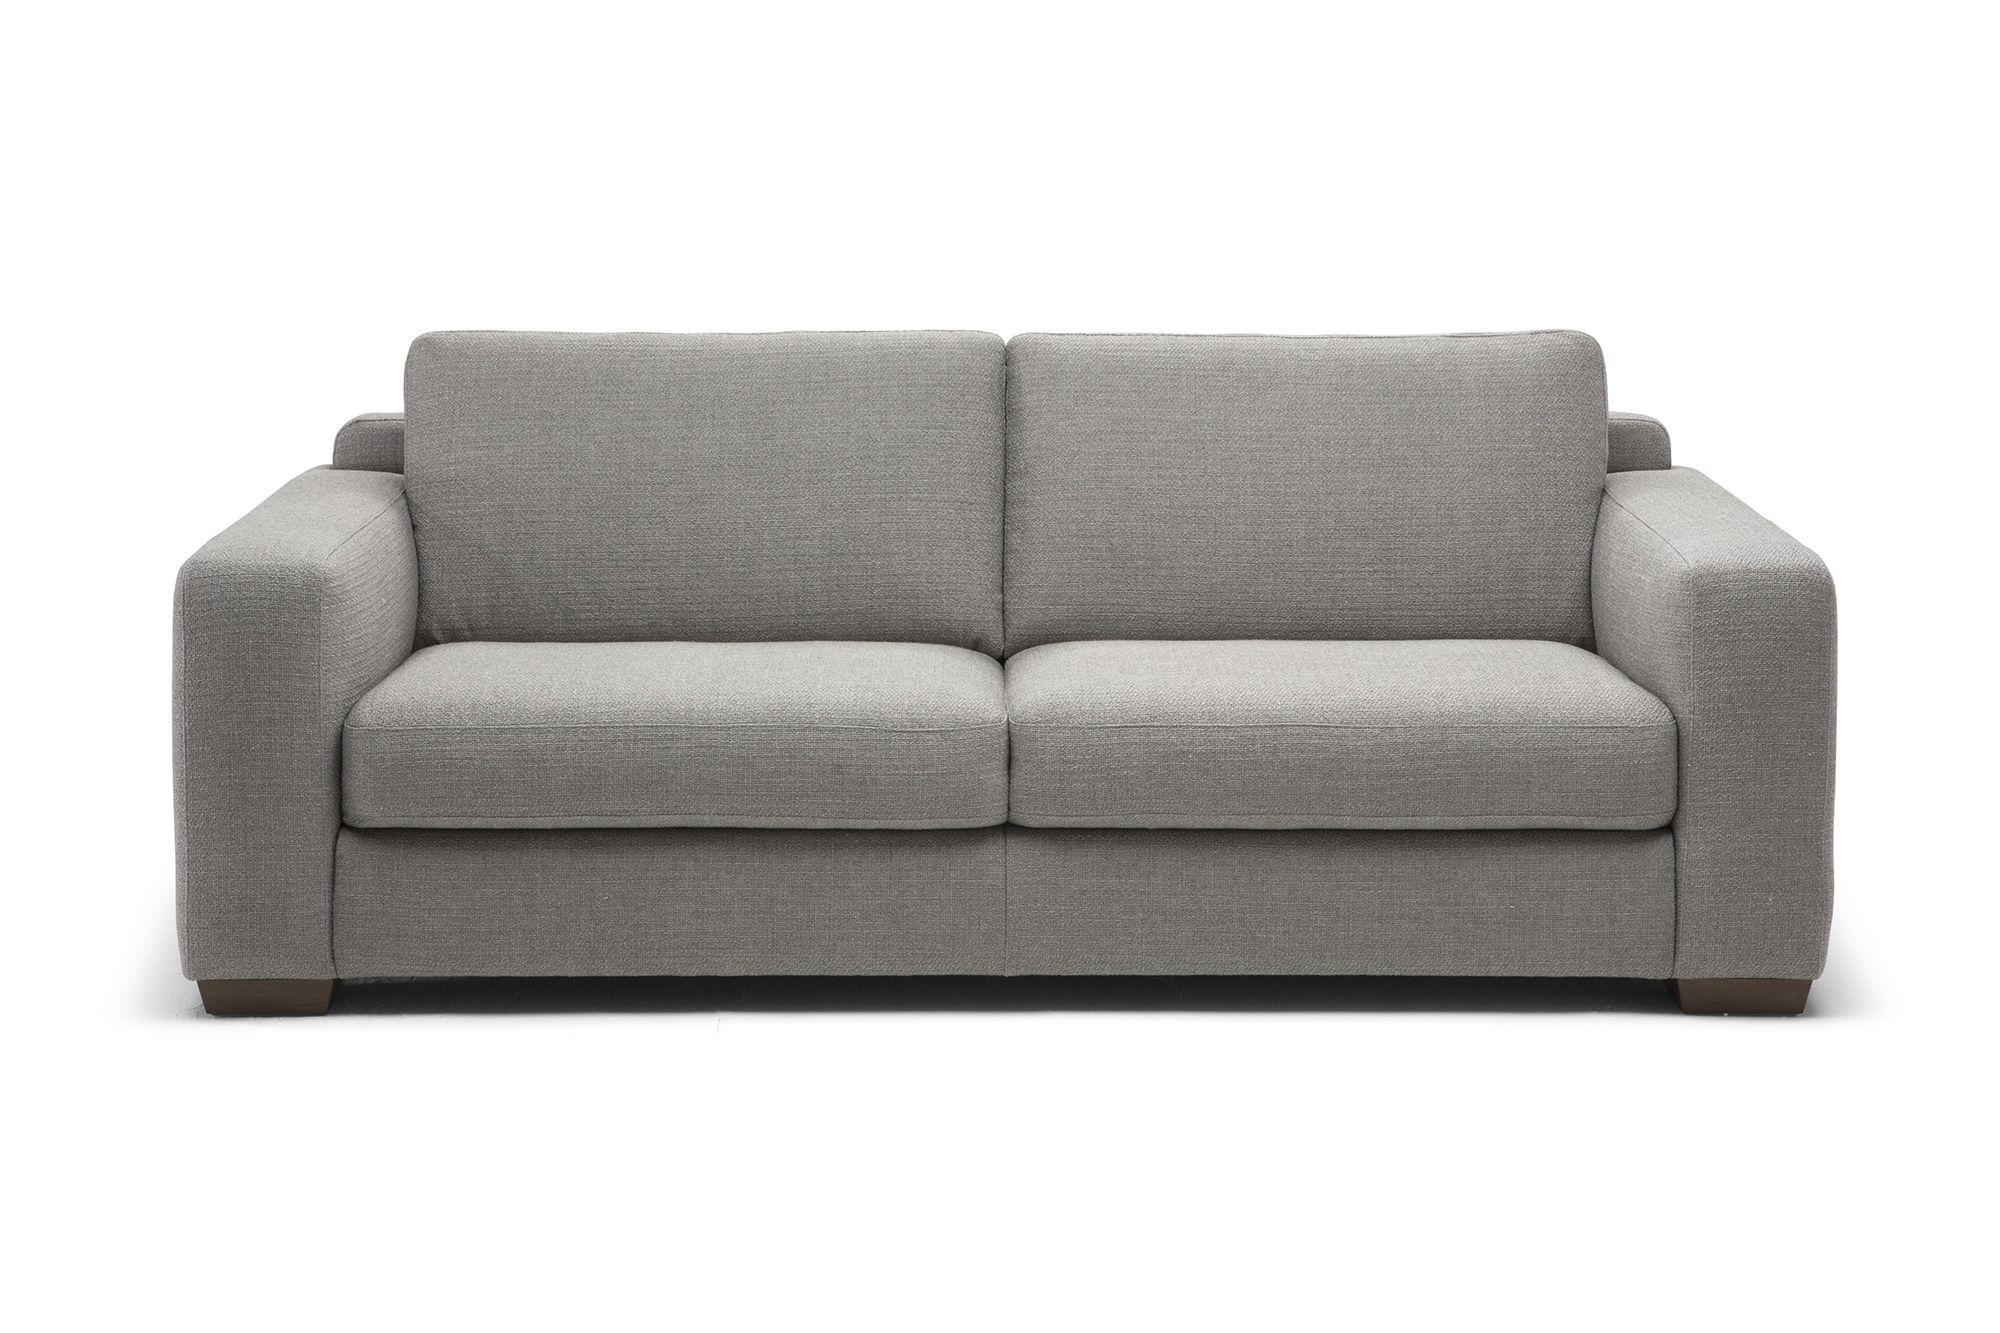 Natuzzi Editions Pasquale 2 5 Seater Sofa Fabric 78 All